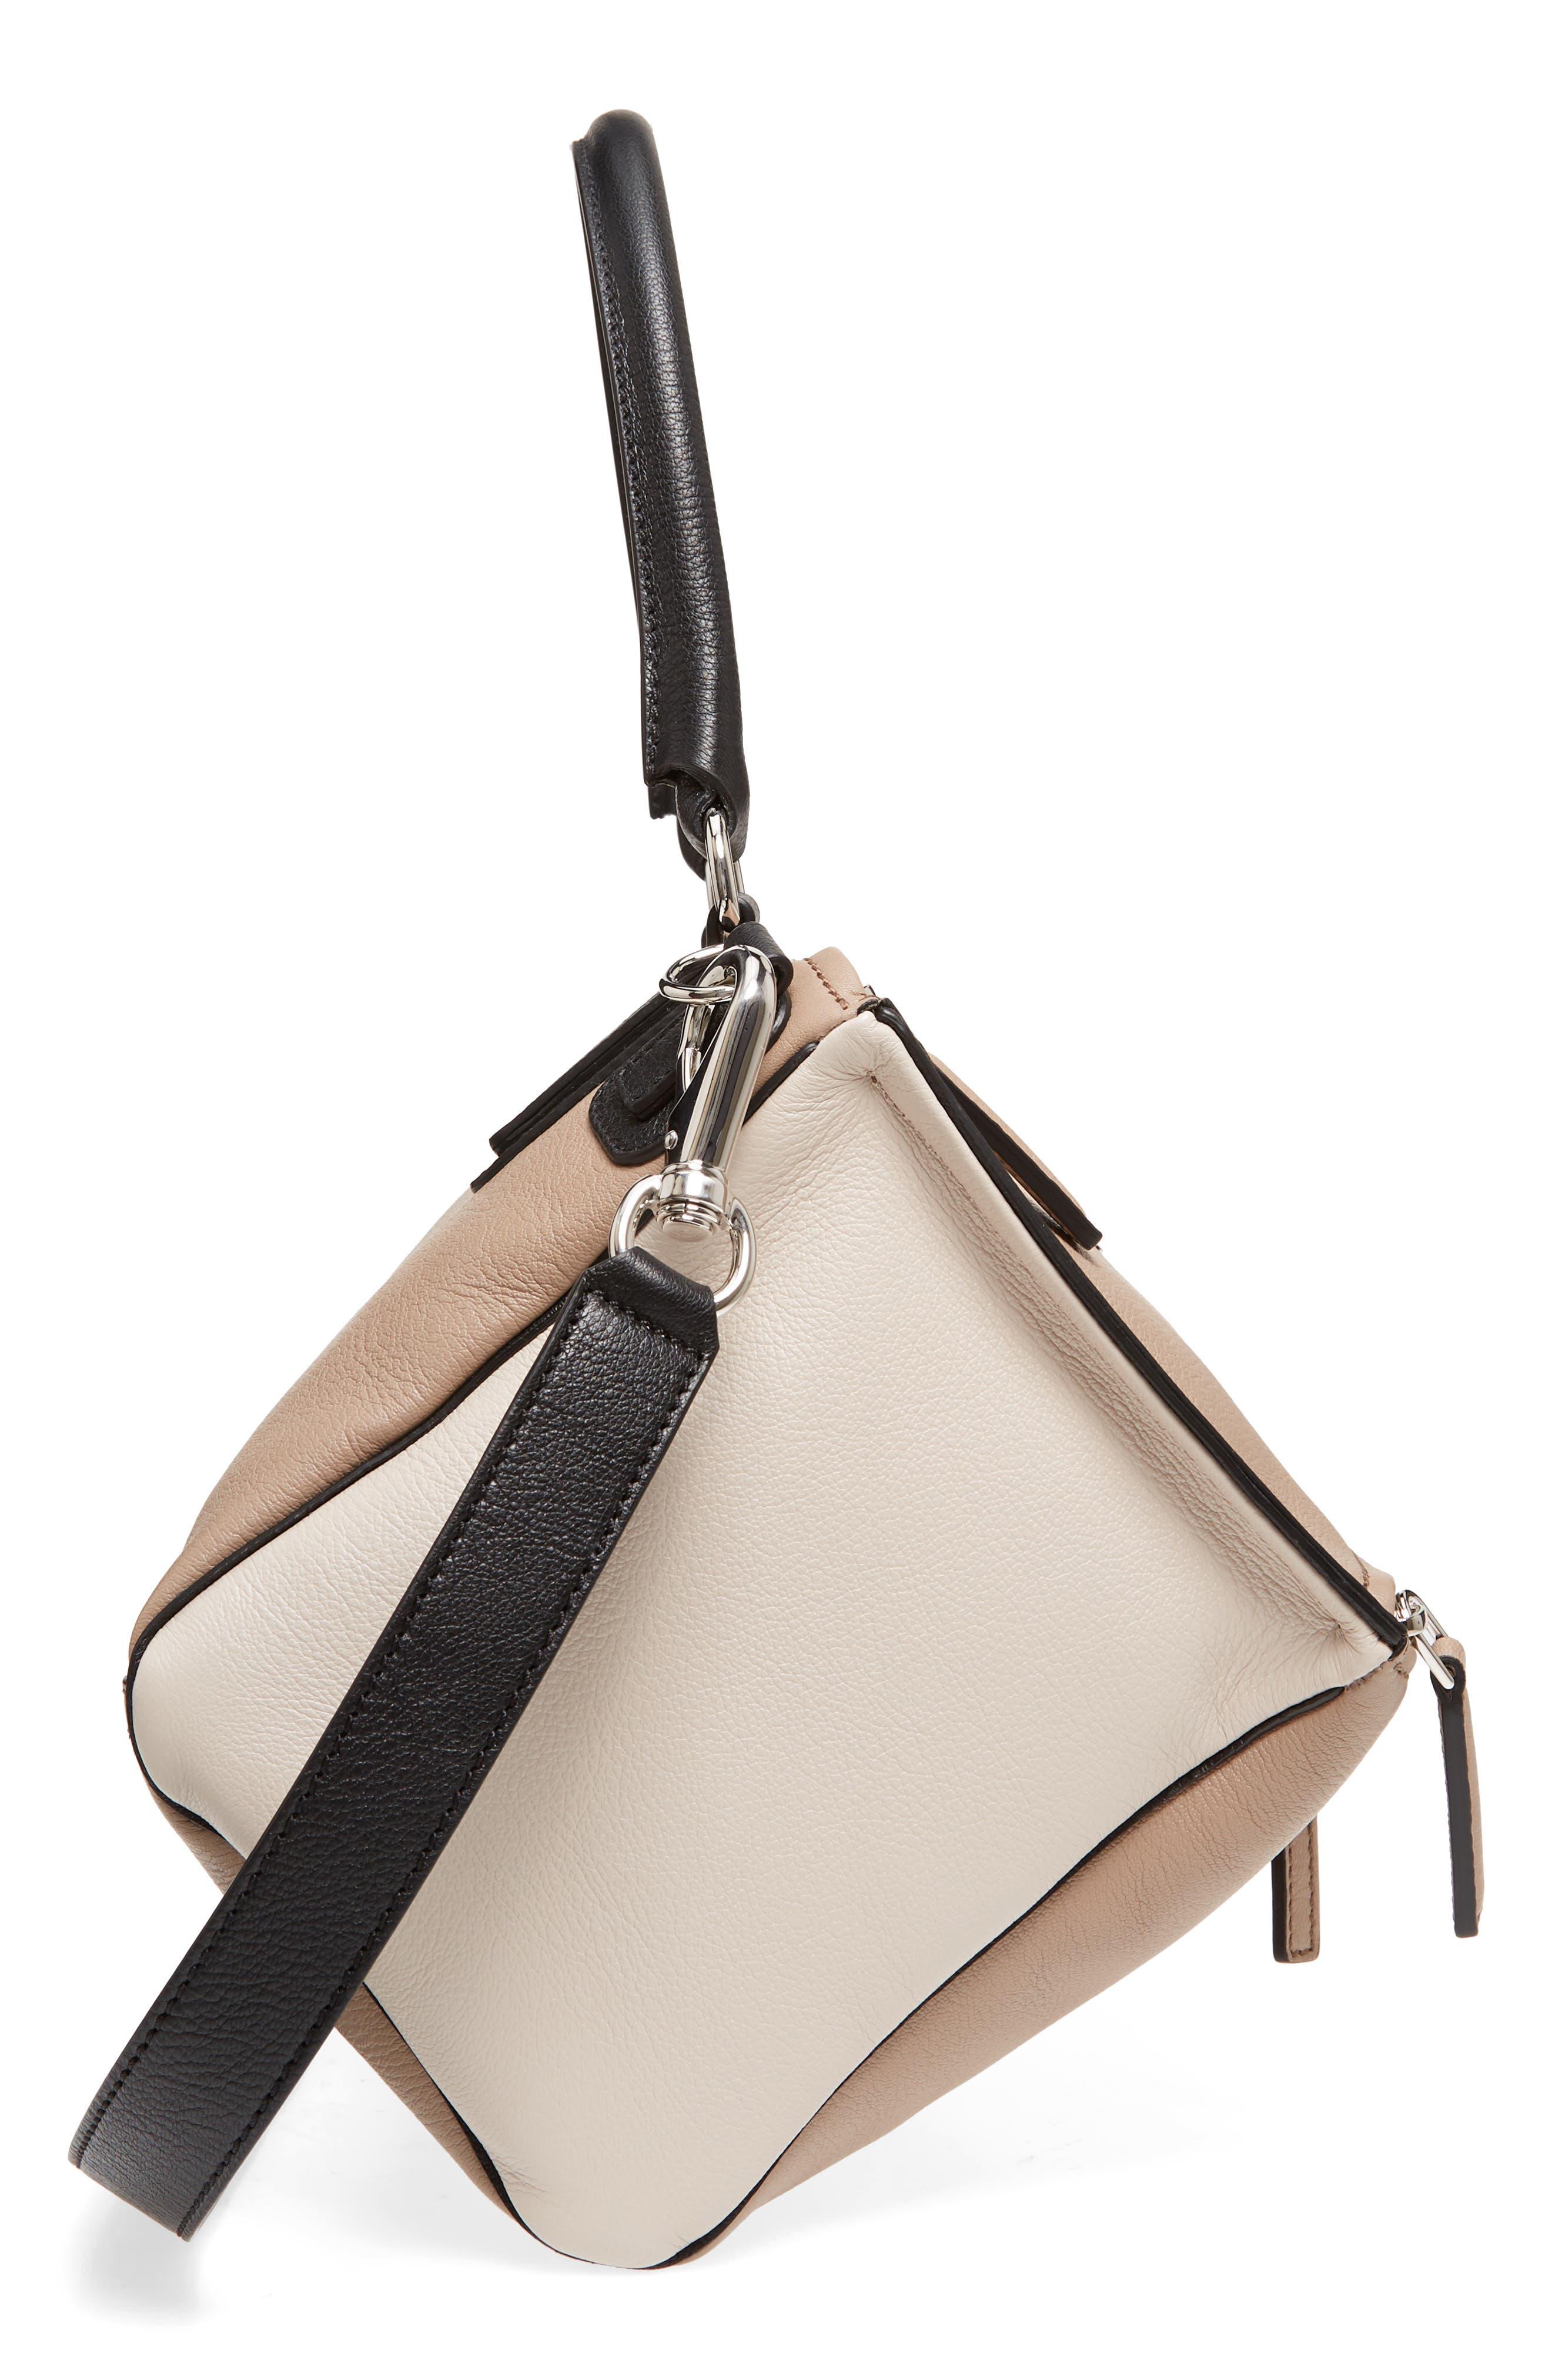 Medium Pandora Box Tricolor Leather Crossbody Bag,                             Alternate thumbnail 5, color,                             Linen